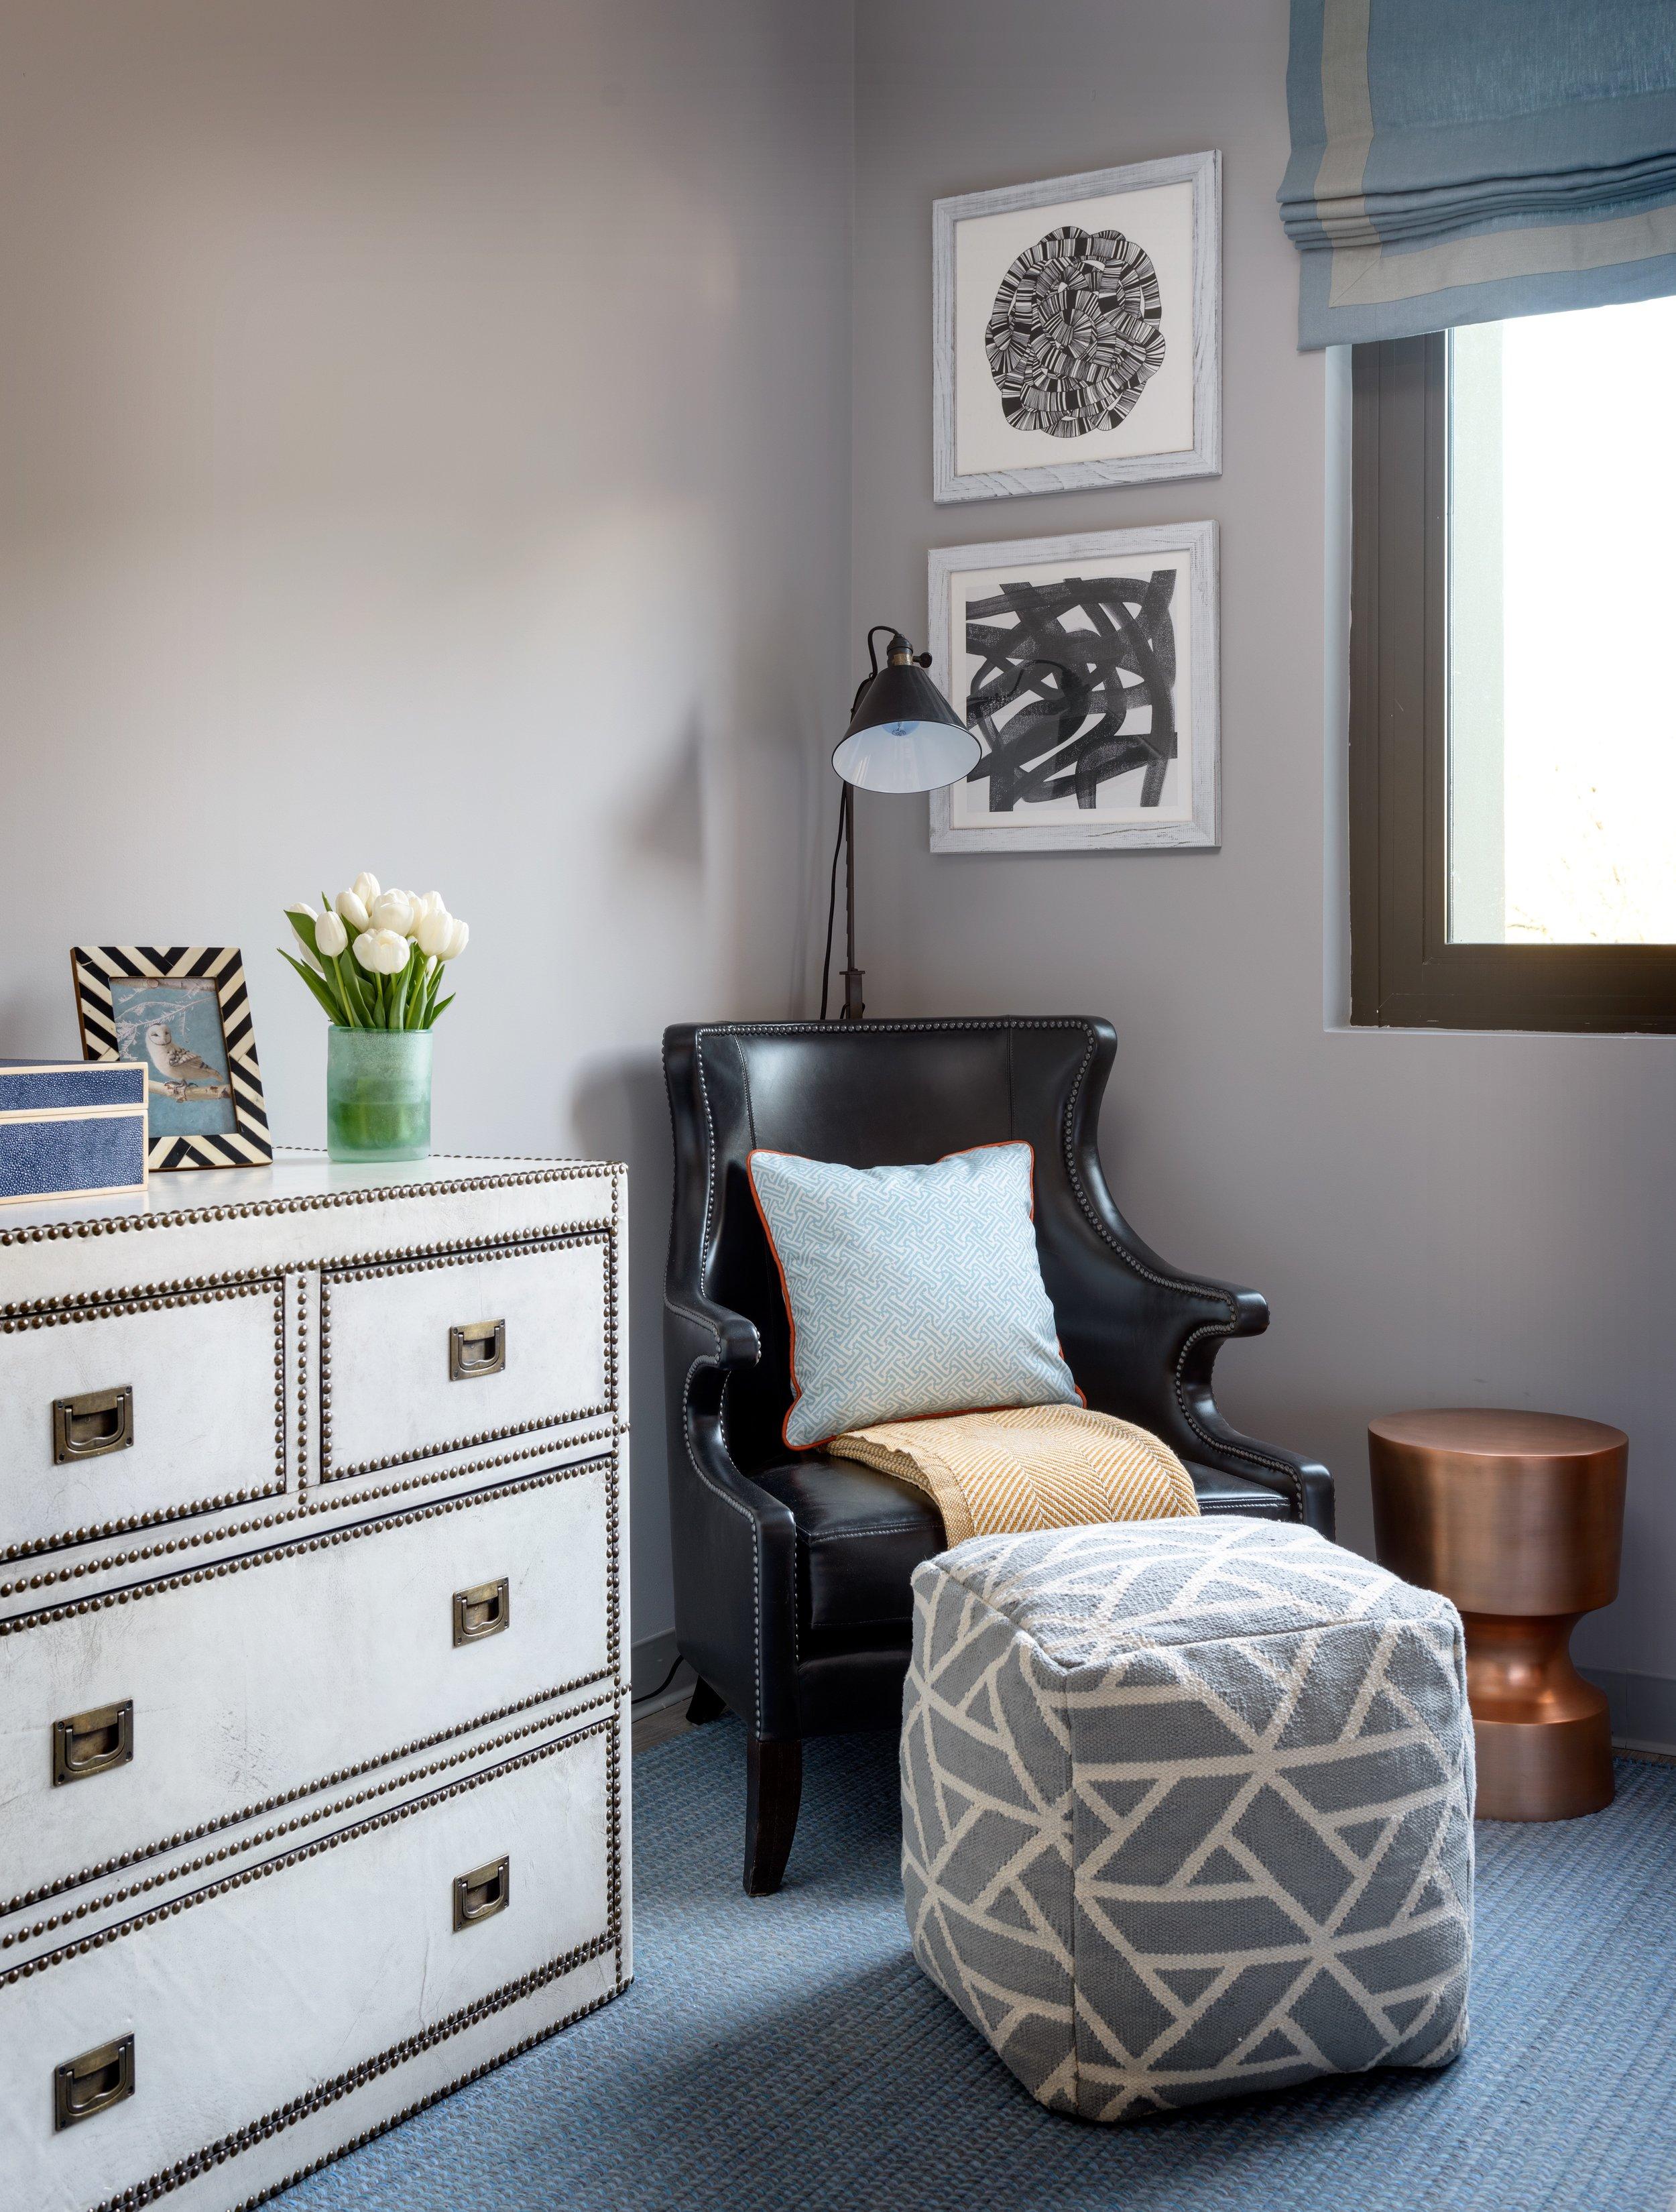 RMH Bedroom 220-A.jpg